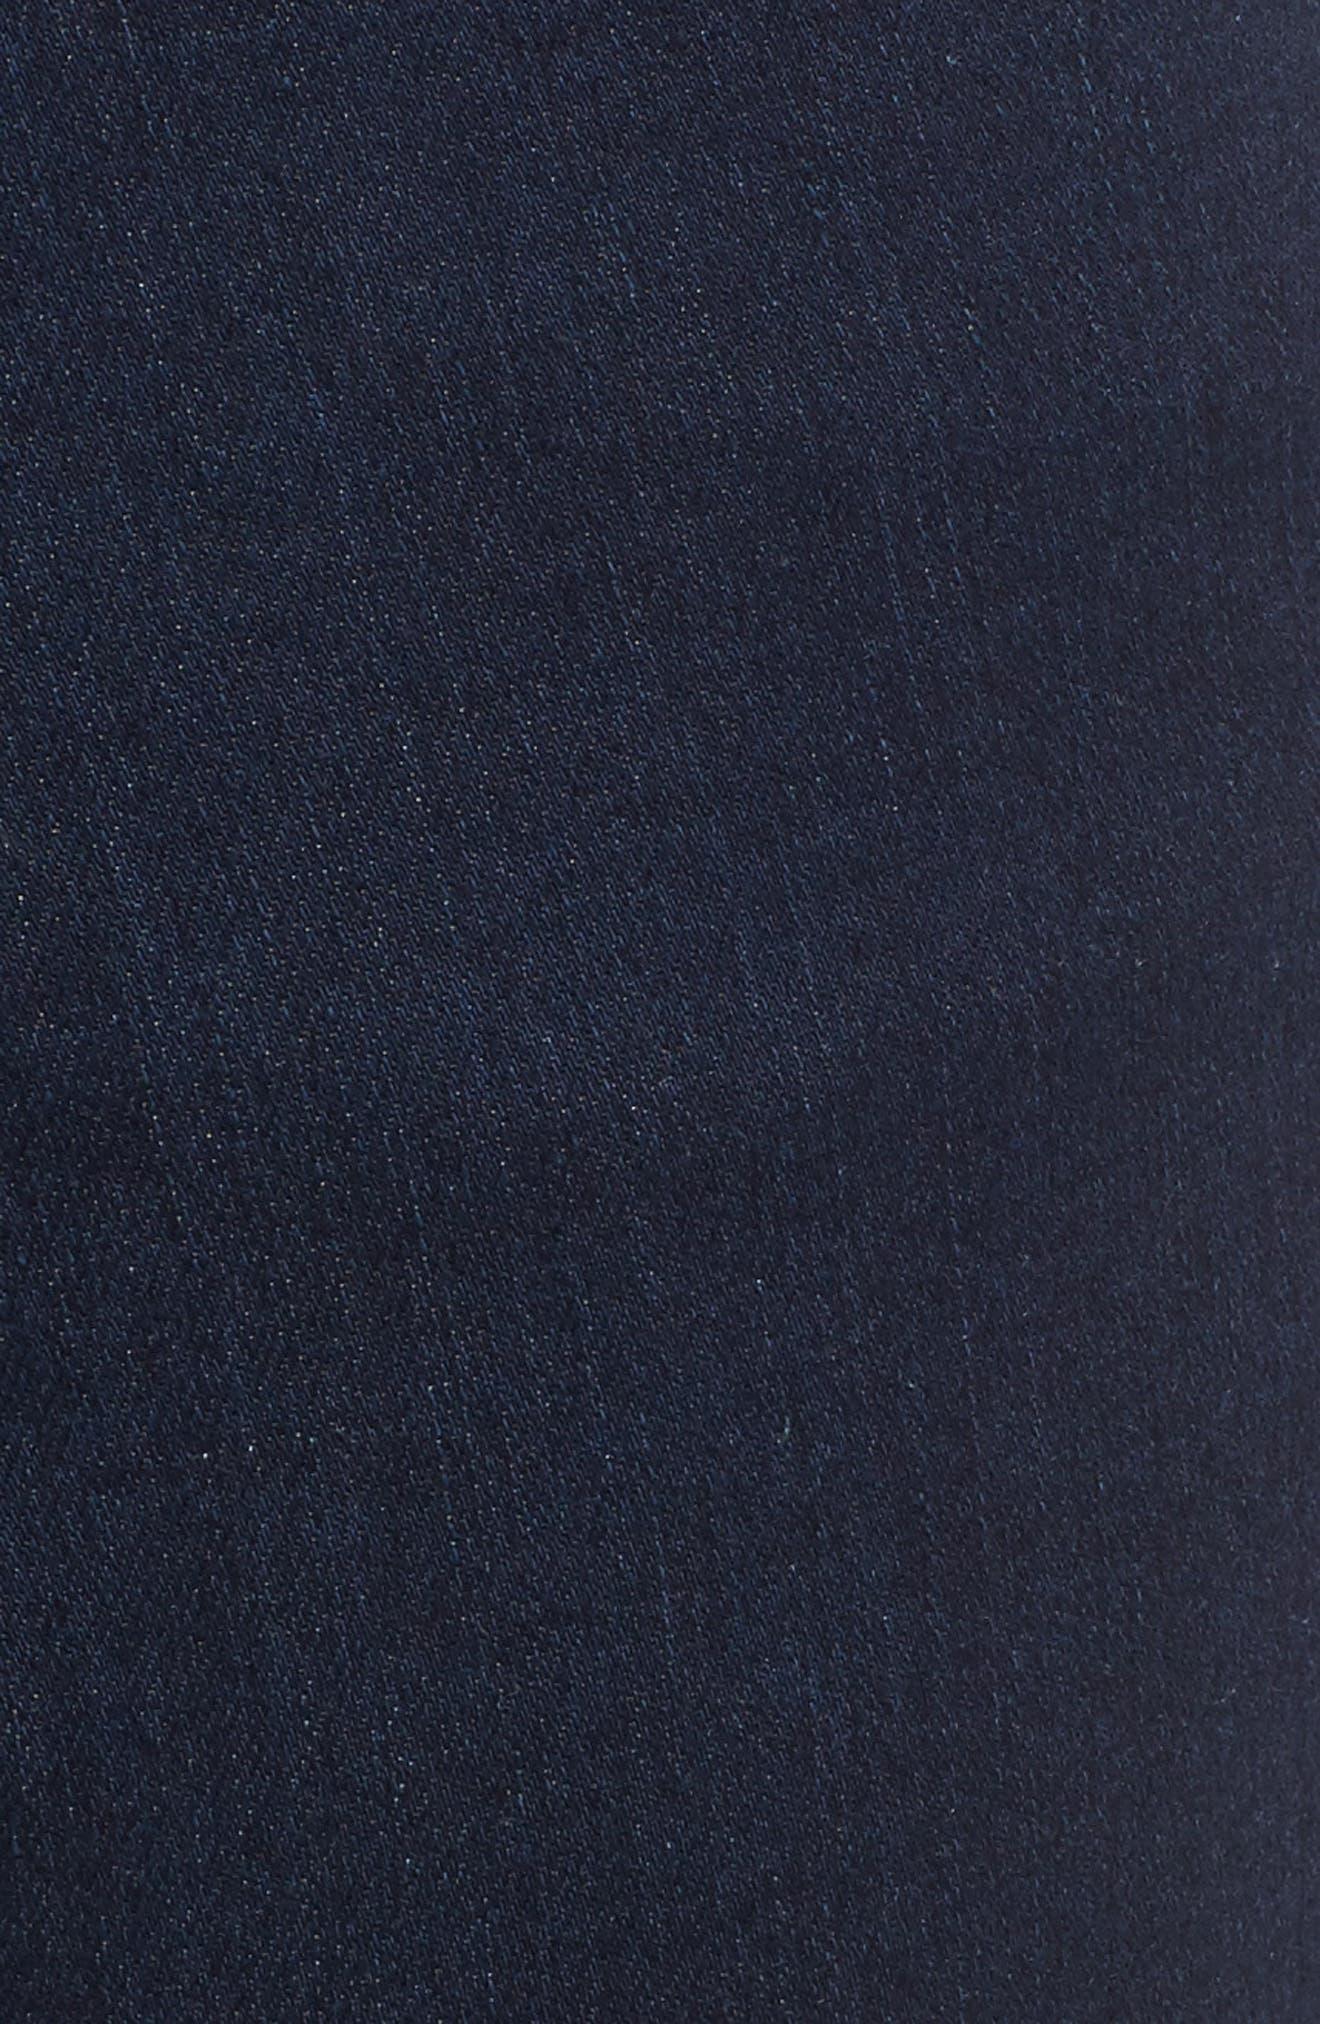 Peri Pull-On Straight Leg Jeans,                             Alternate thumbnail 5, color,                             DARK INDIGO